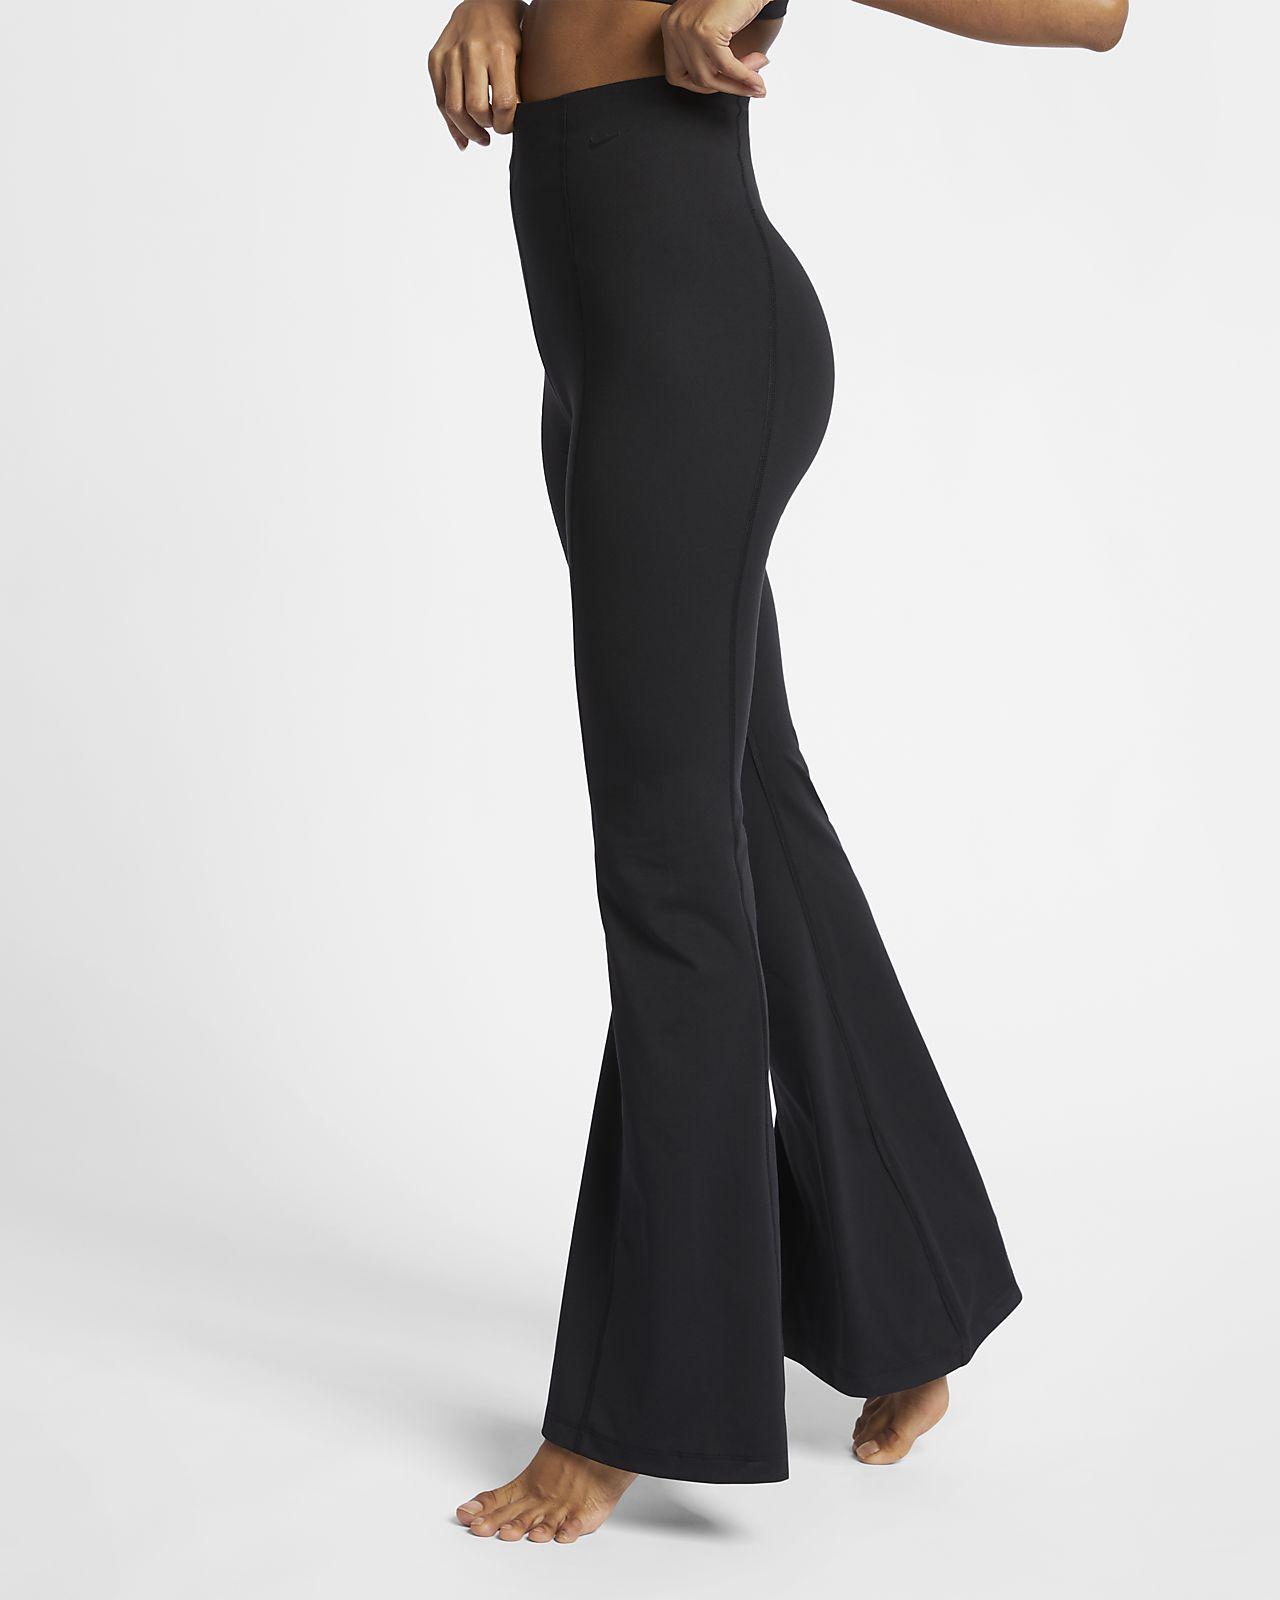 Nike Power Studio Lux Malles de ioga - Dona